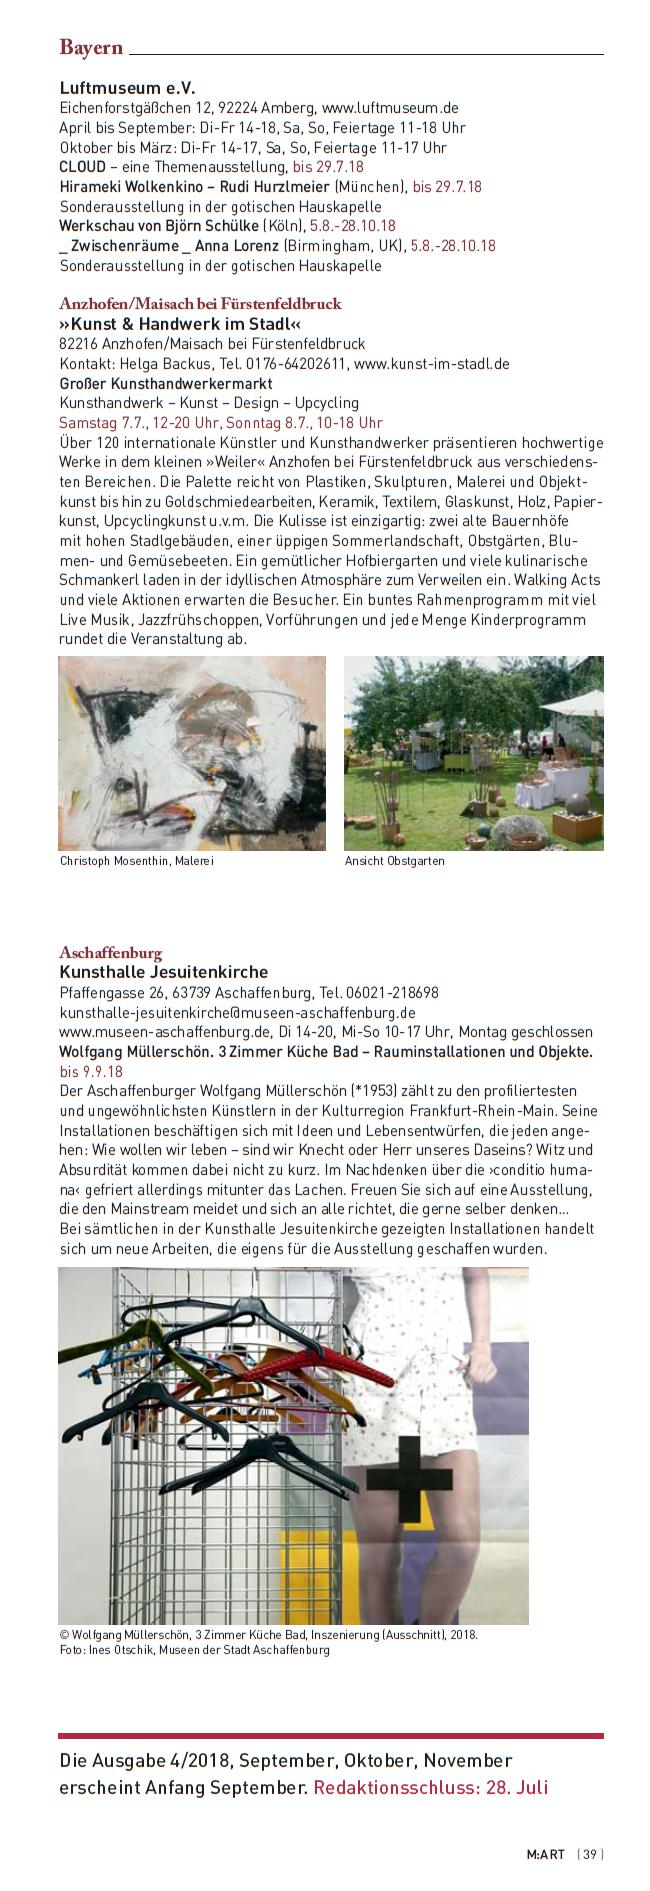 2018_03 M:ART München